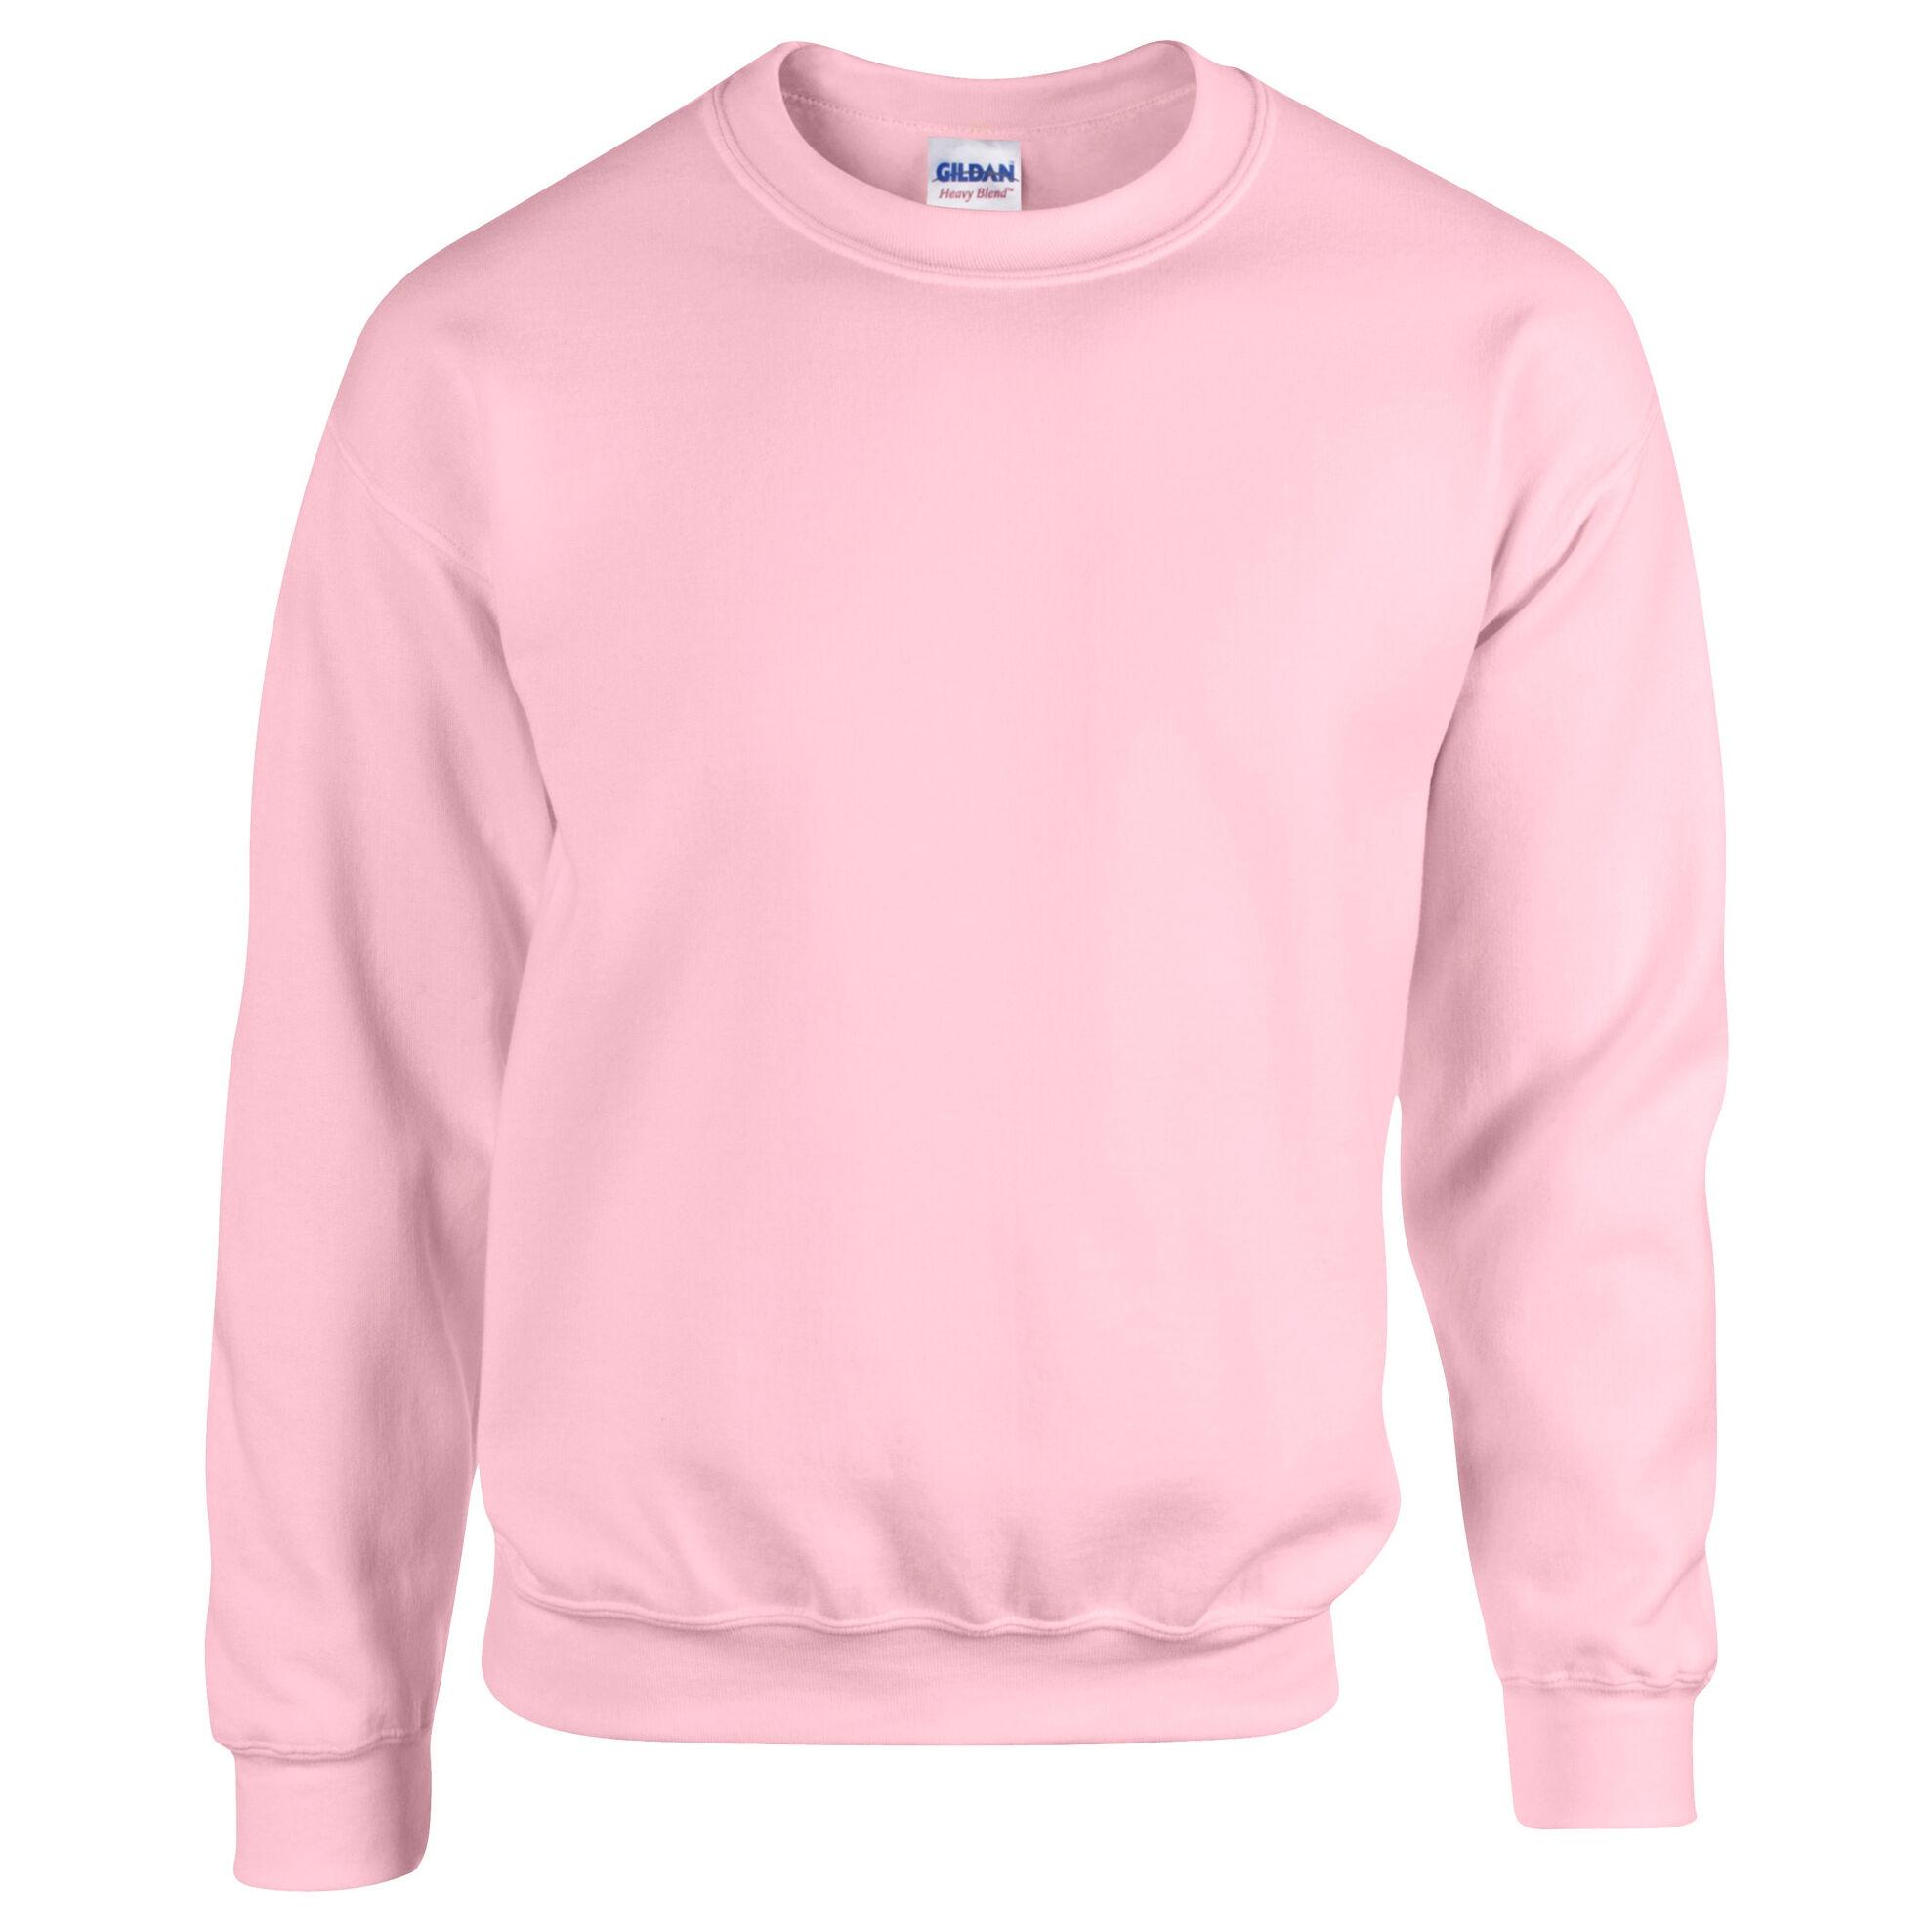 Gildan - Sweatshirt - Adulte Unisexe (Gris sport) - UTBC463